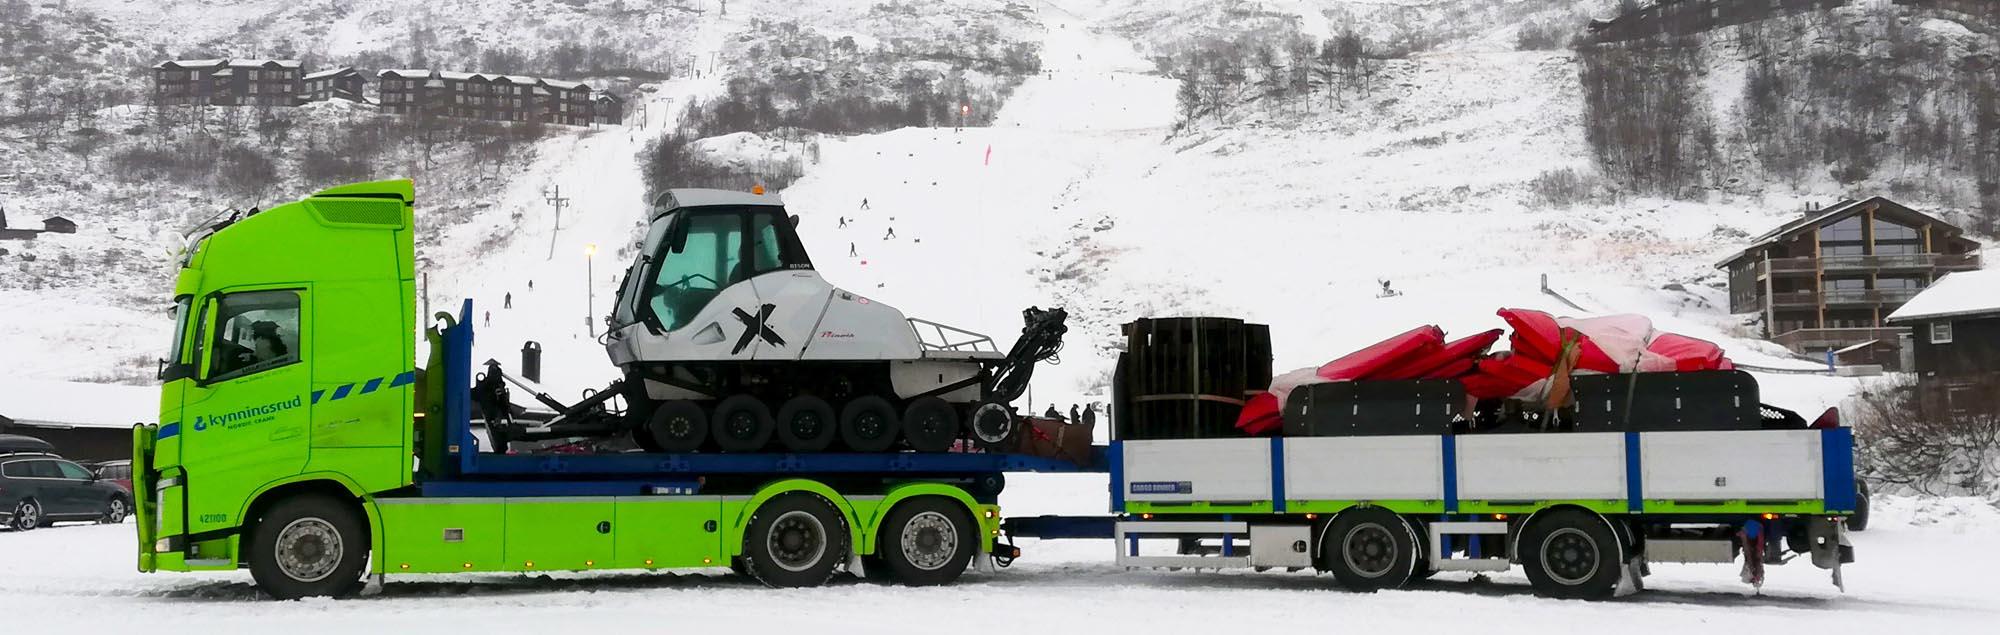 Kynningsrud Nordic Crane sikrer gode løypeforhold